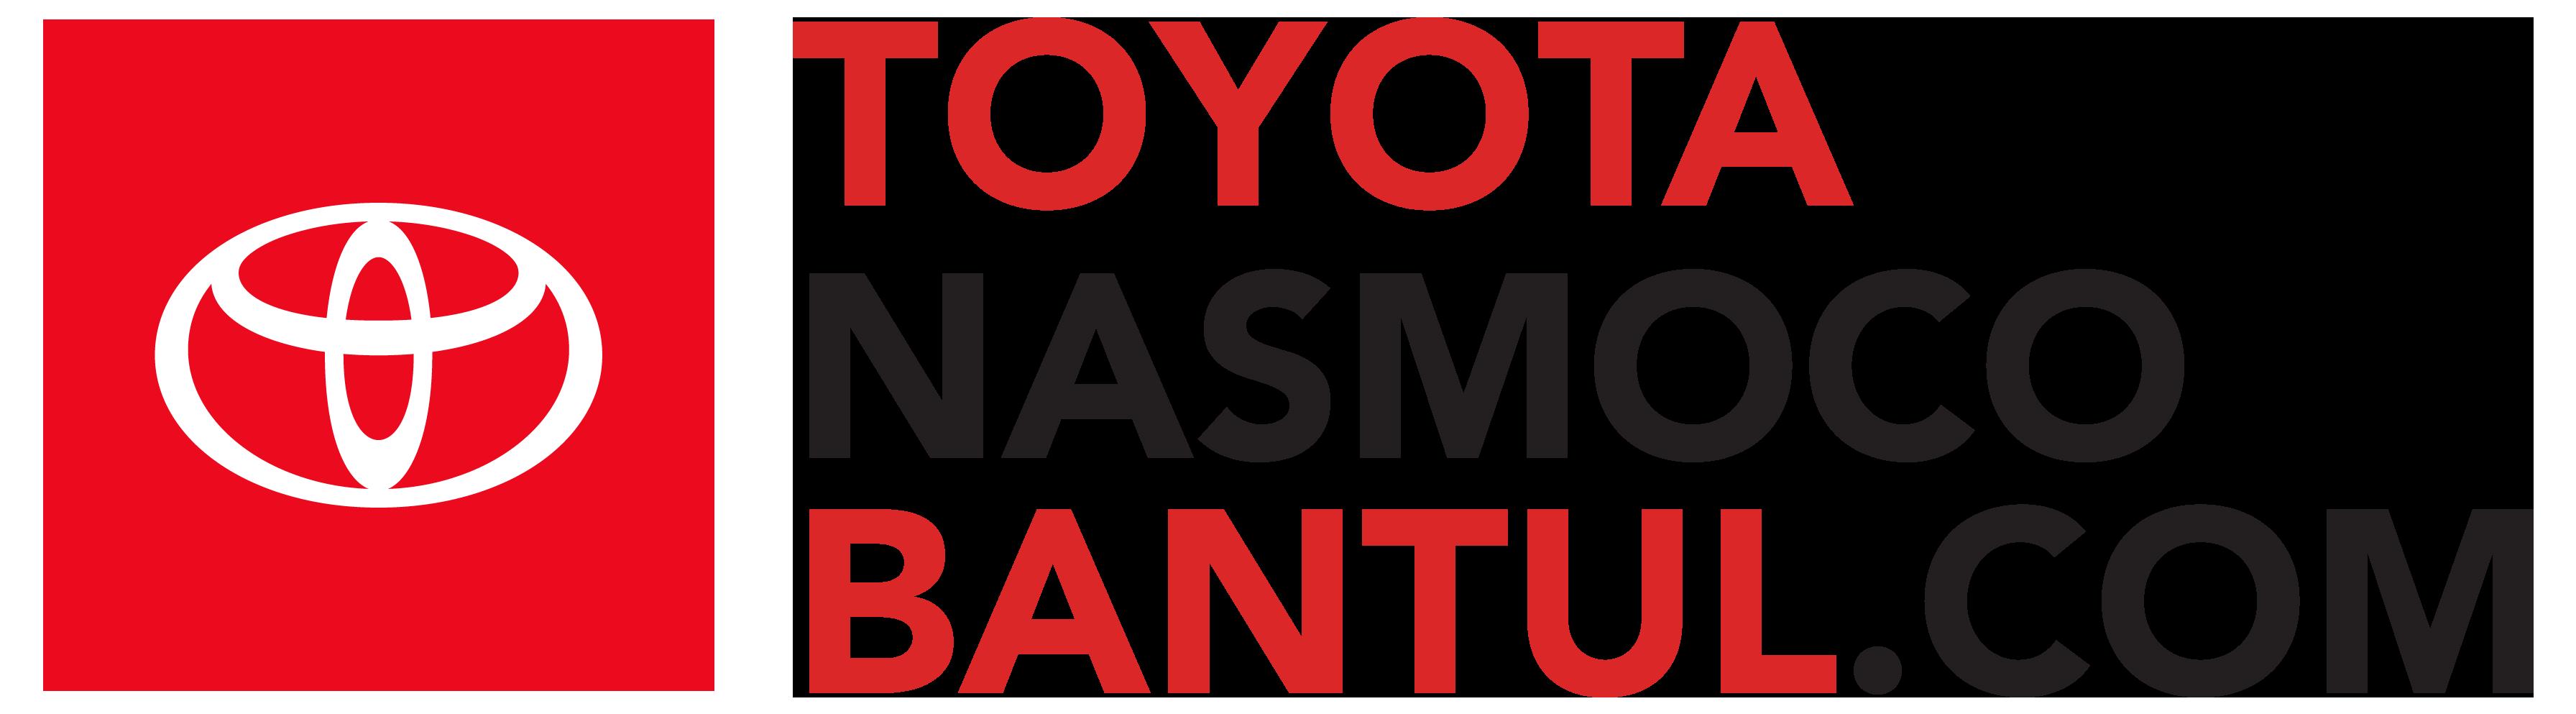 Toyota Nasmoco Bantul